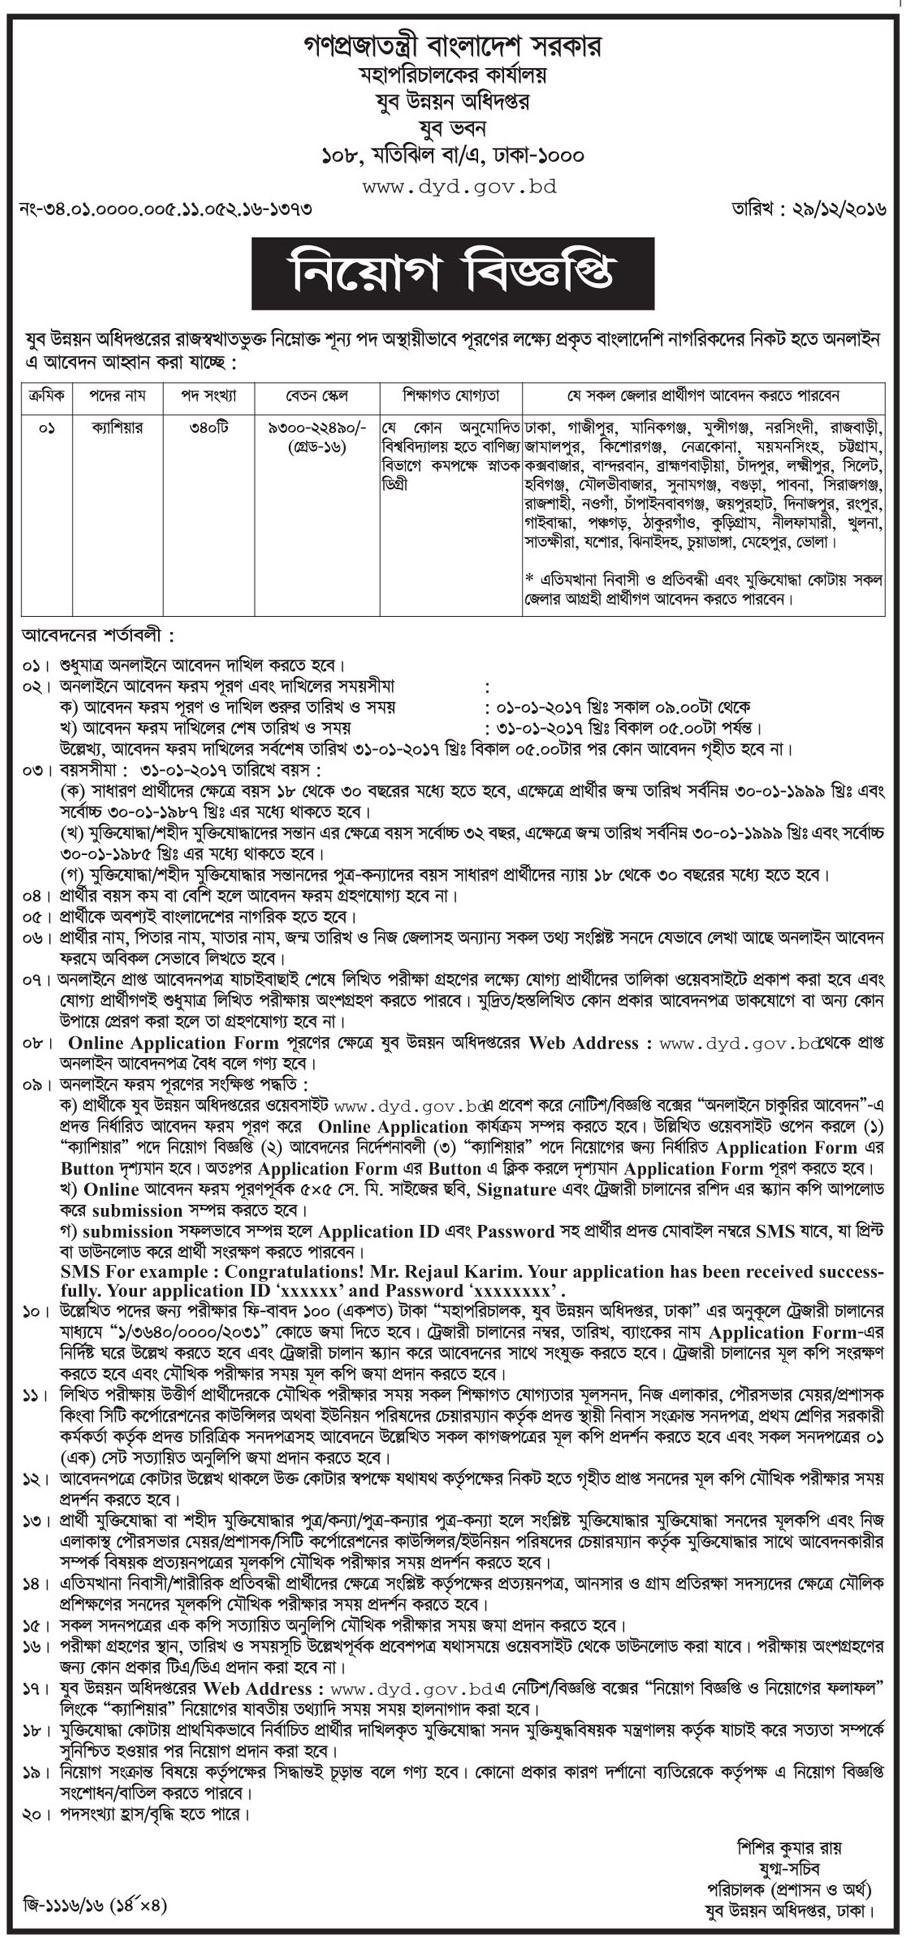 Department of youth development job circular